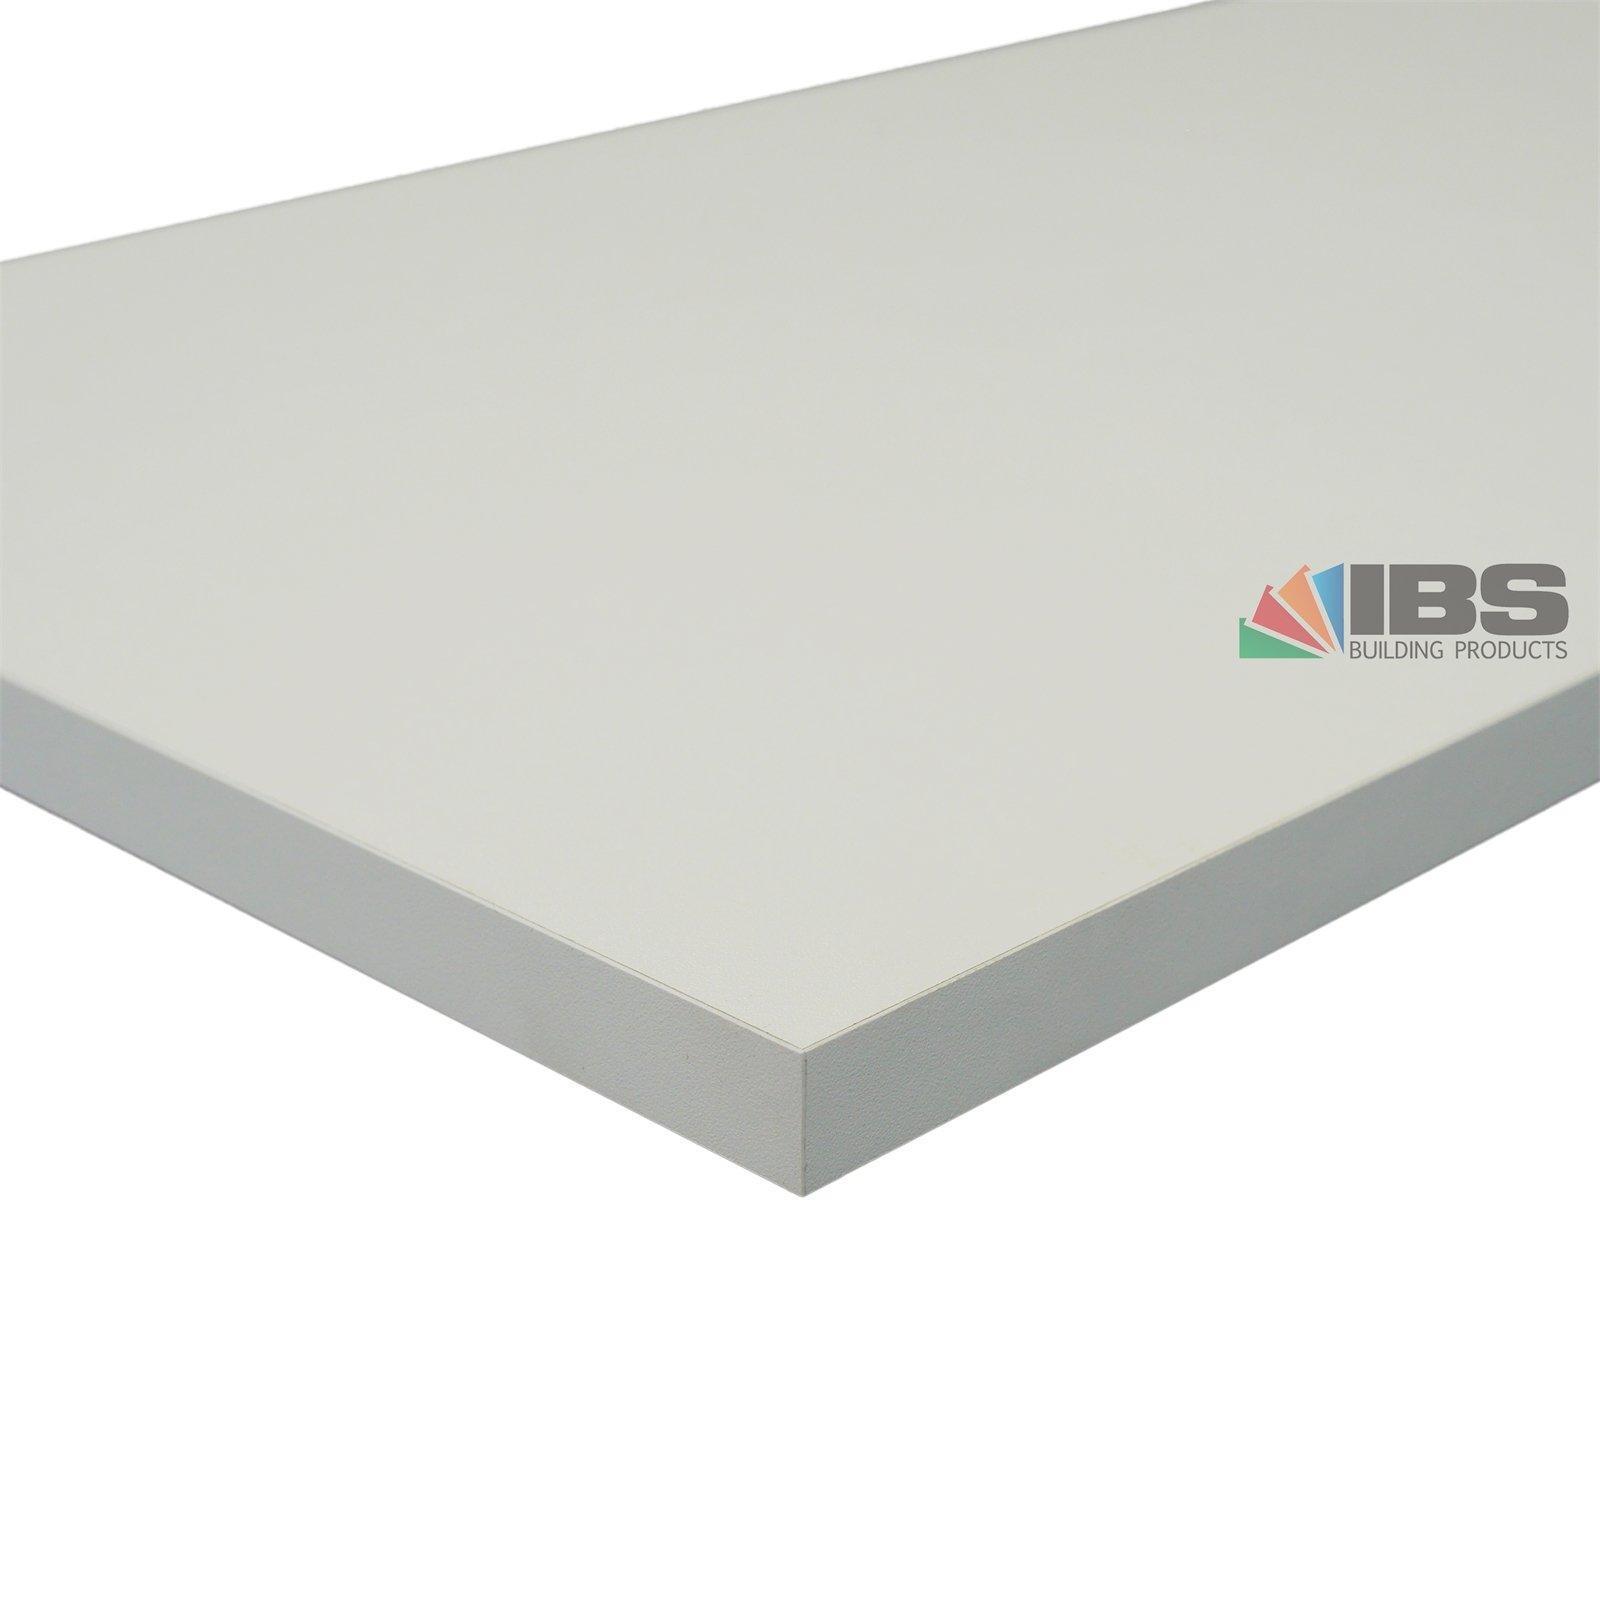 IBS Mini Panel 2400 x 300 x 16mm White Melamine